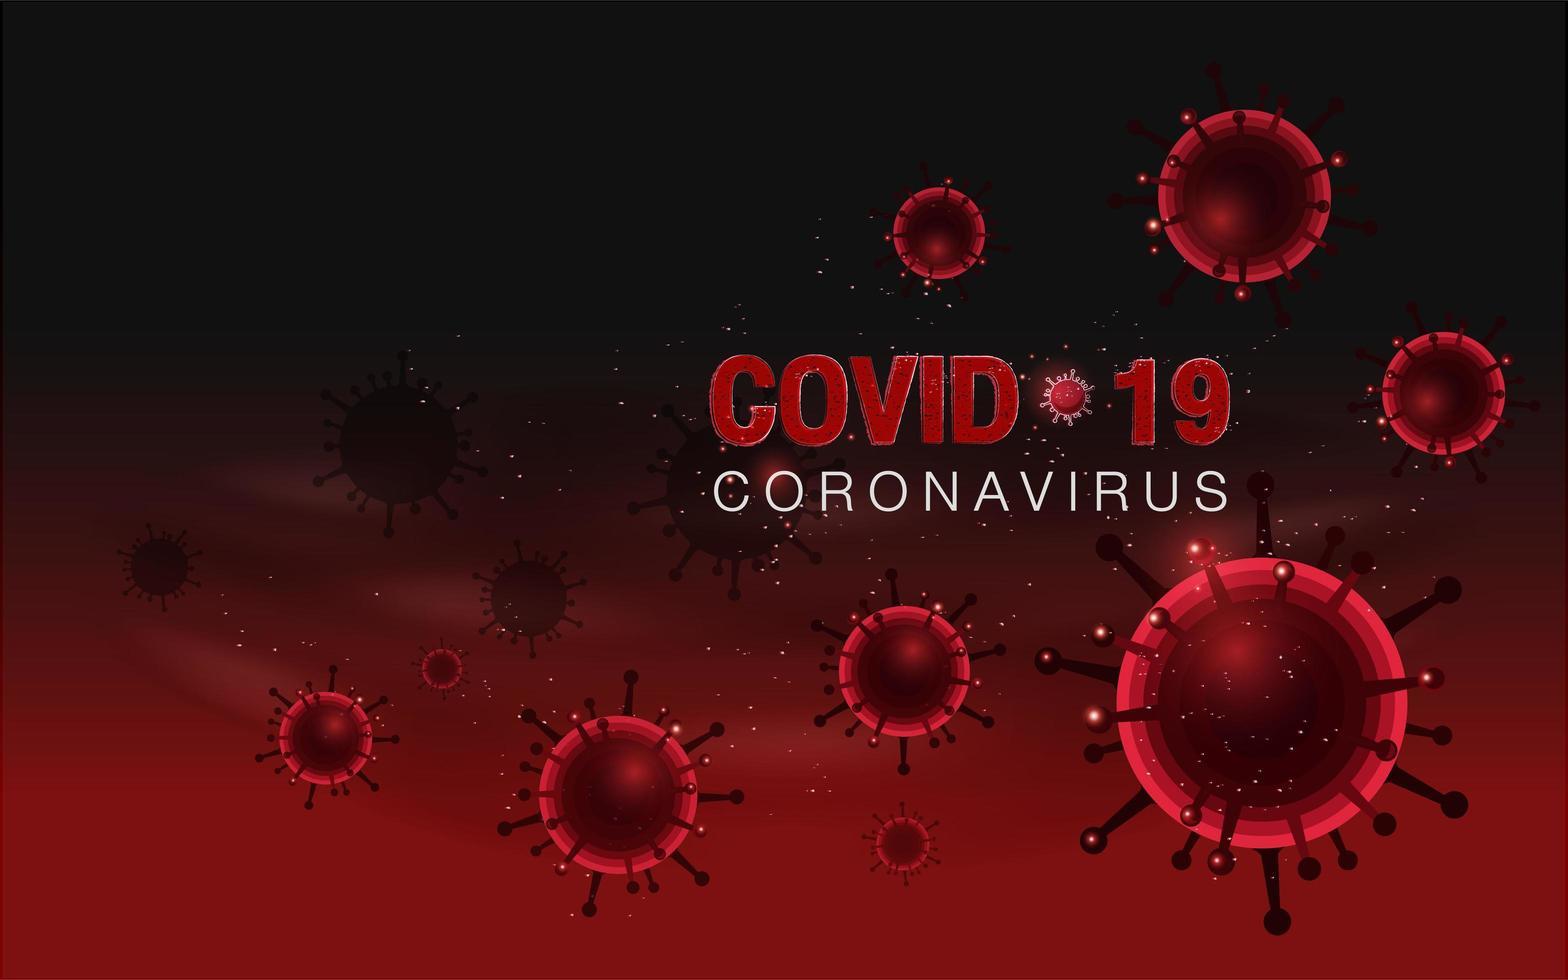 fondo rojo coronavirus covid-19 vector